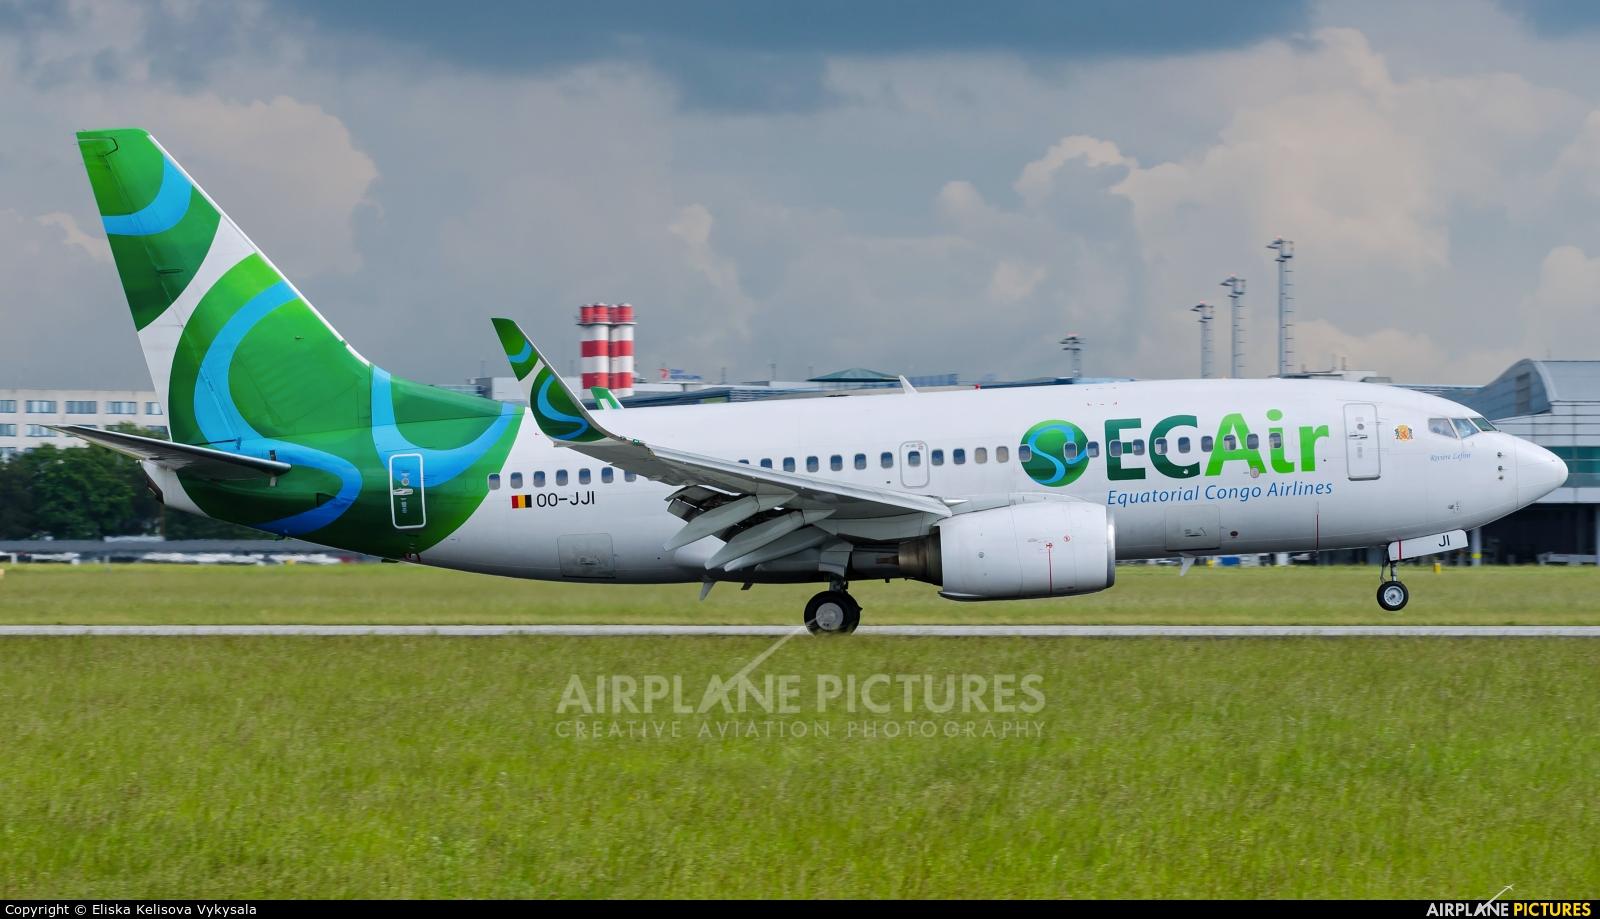 EC Air - Equatorial Congo Airlines OO-JJI aircraft at Prague - Václav Havel